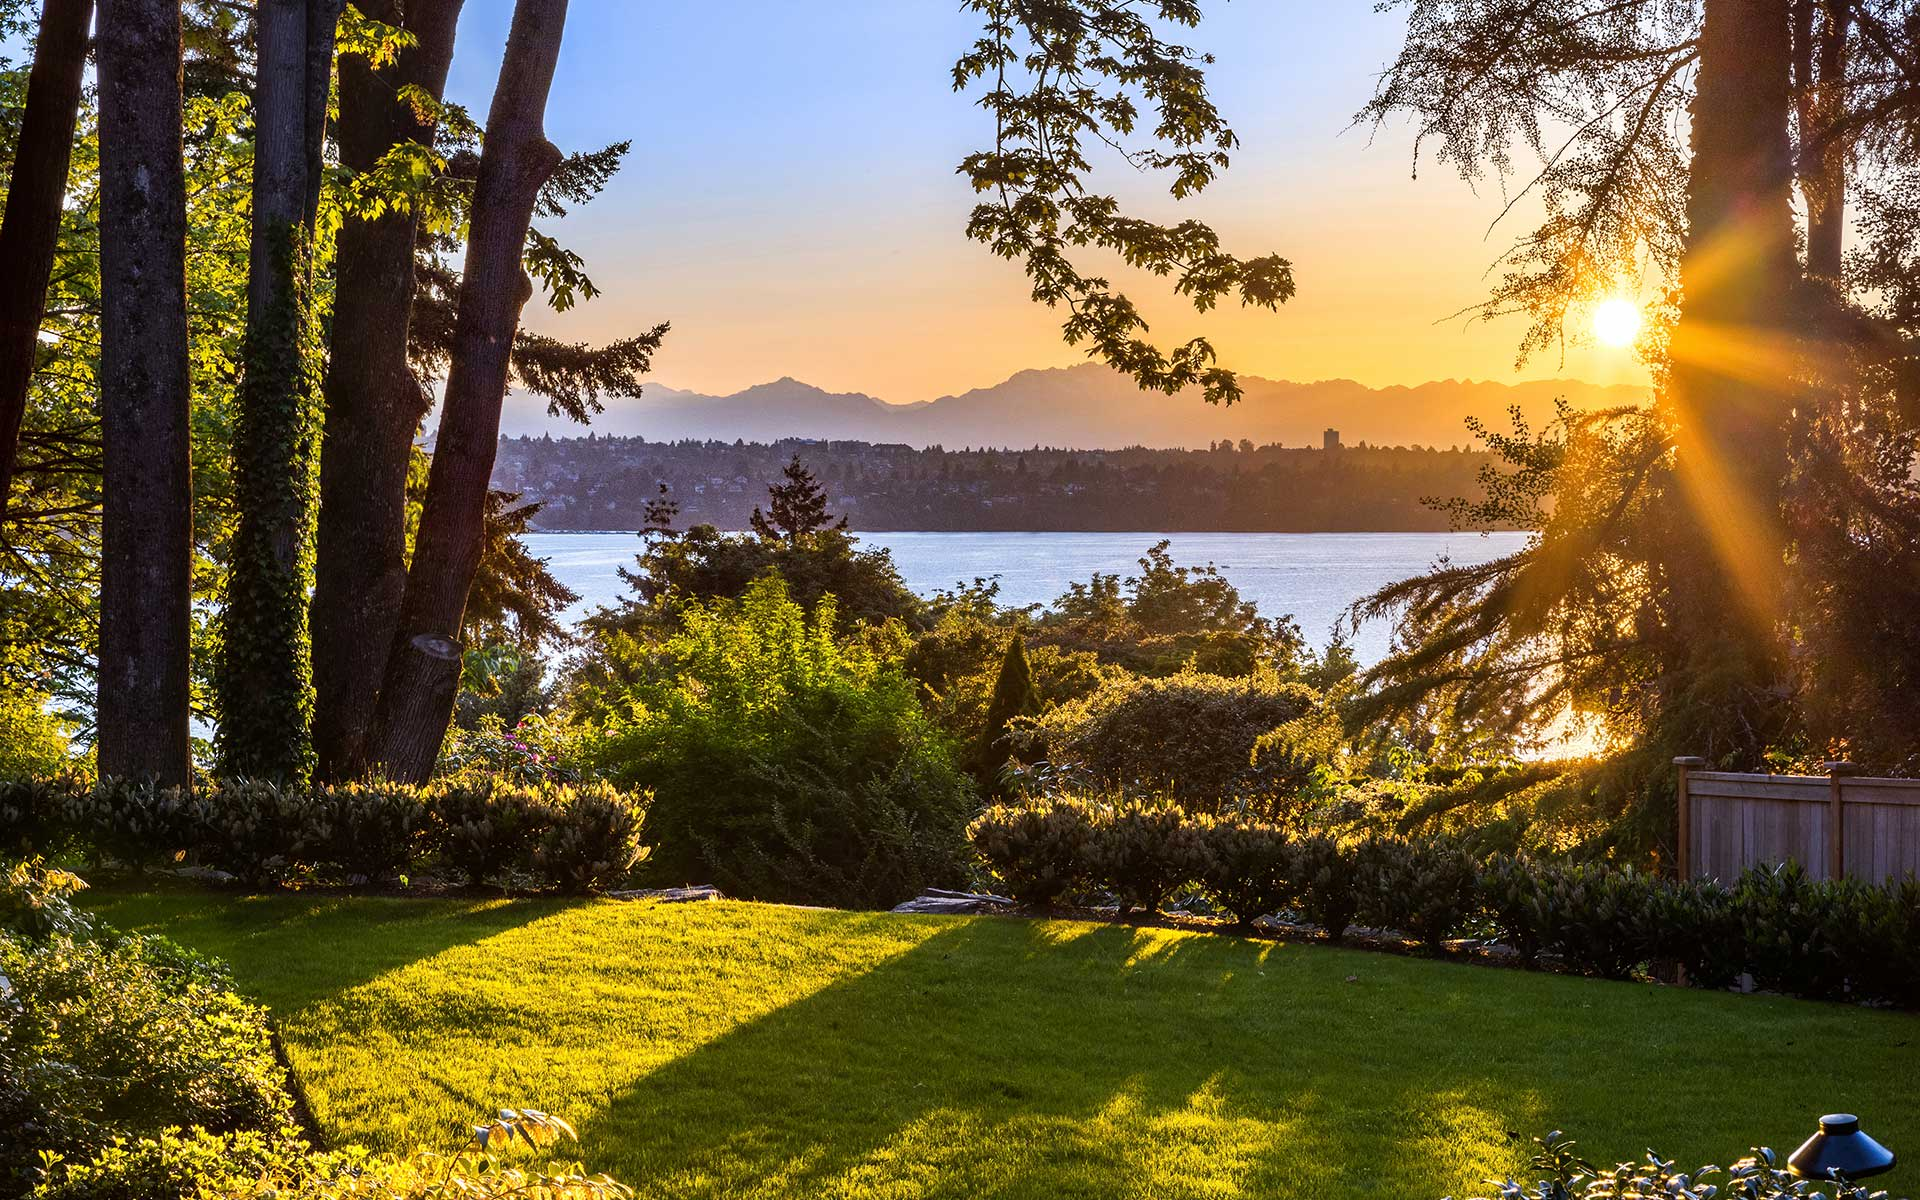 East Coast Inspiration on the Island's Westside photo